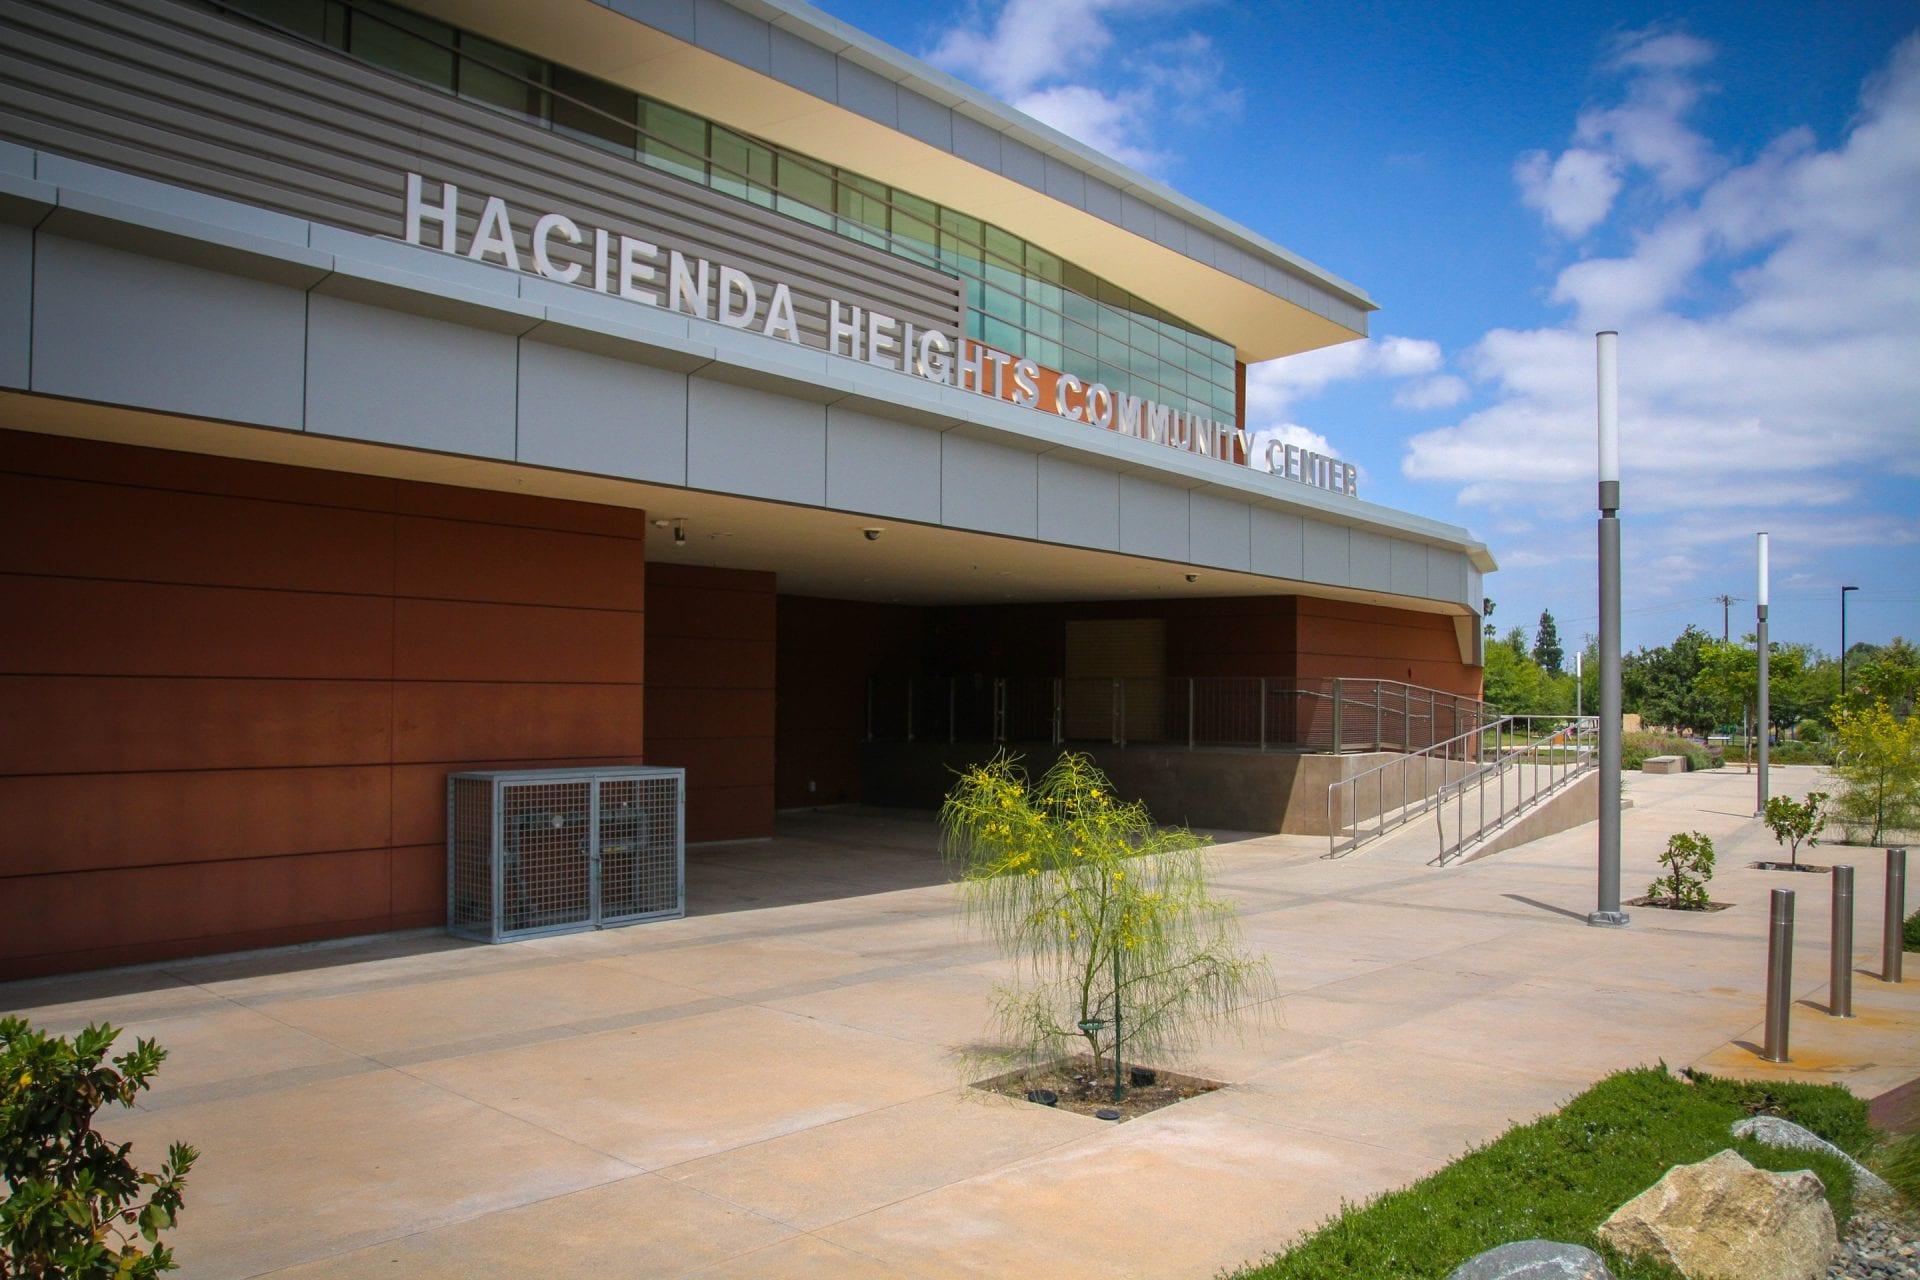 Haciendaheights Communitycenter Of X on Aztec Dance Fitness